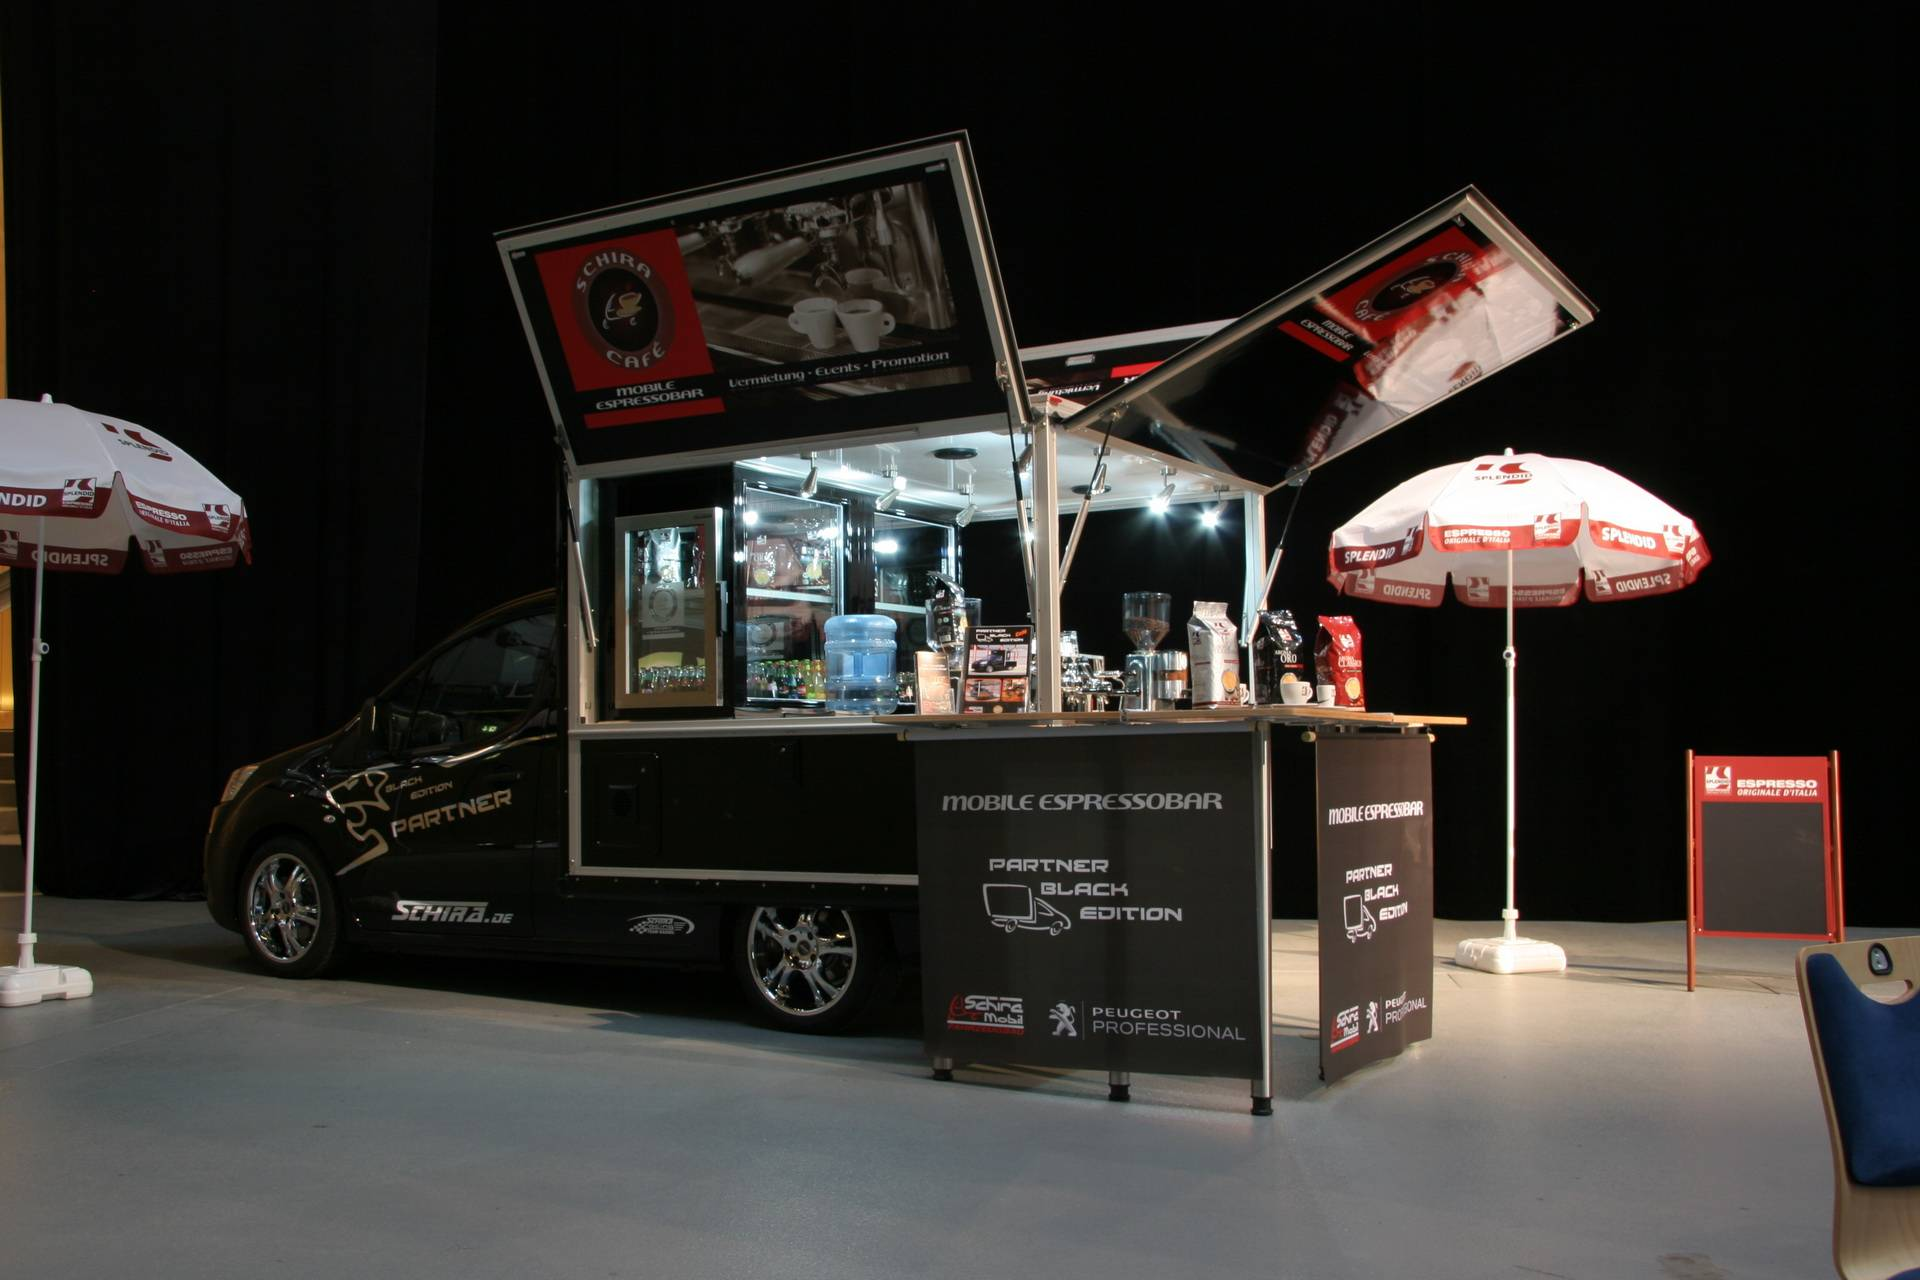 peugeot partner in der version espressomobil auf dem pro mensch forum in m nchen schira mobil. Black Bedroom Furniture Sets. Home Design Ideas